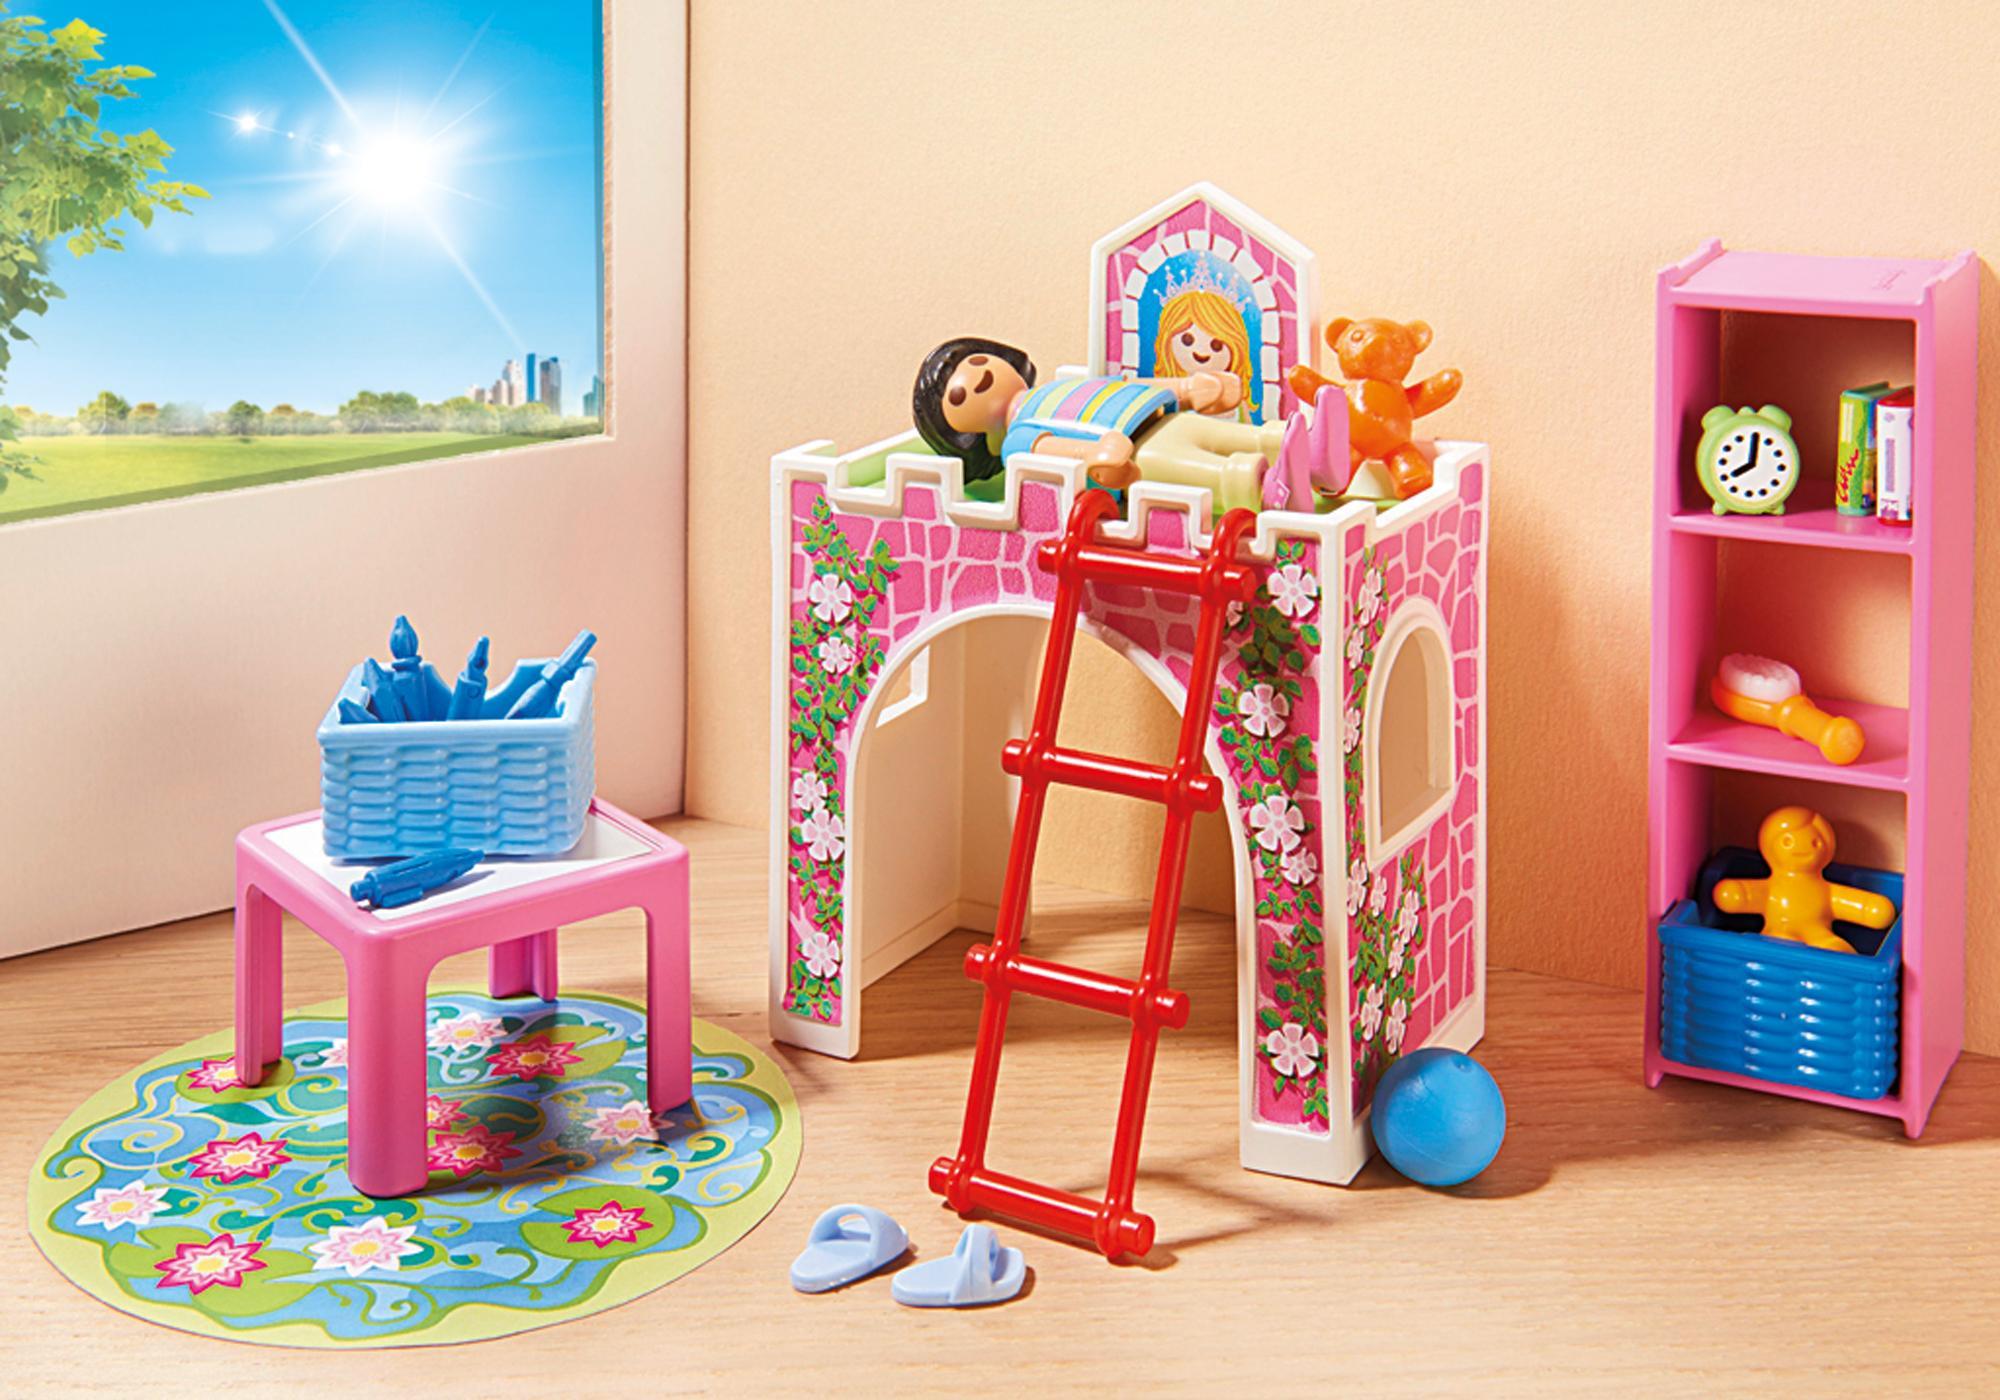 http://media.playmobil.com/i/playmobil/9270_product_extra1/Children's Room